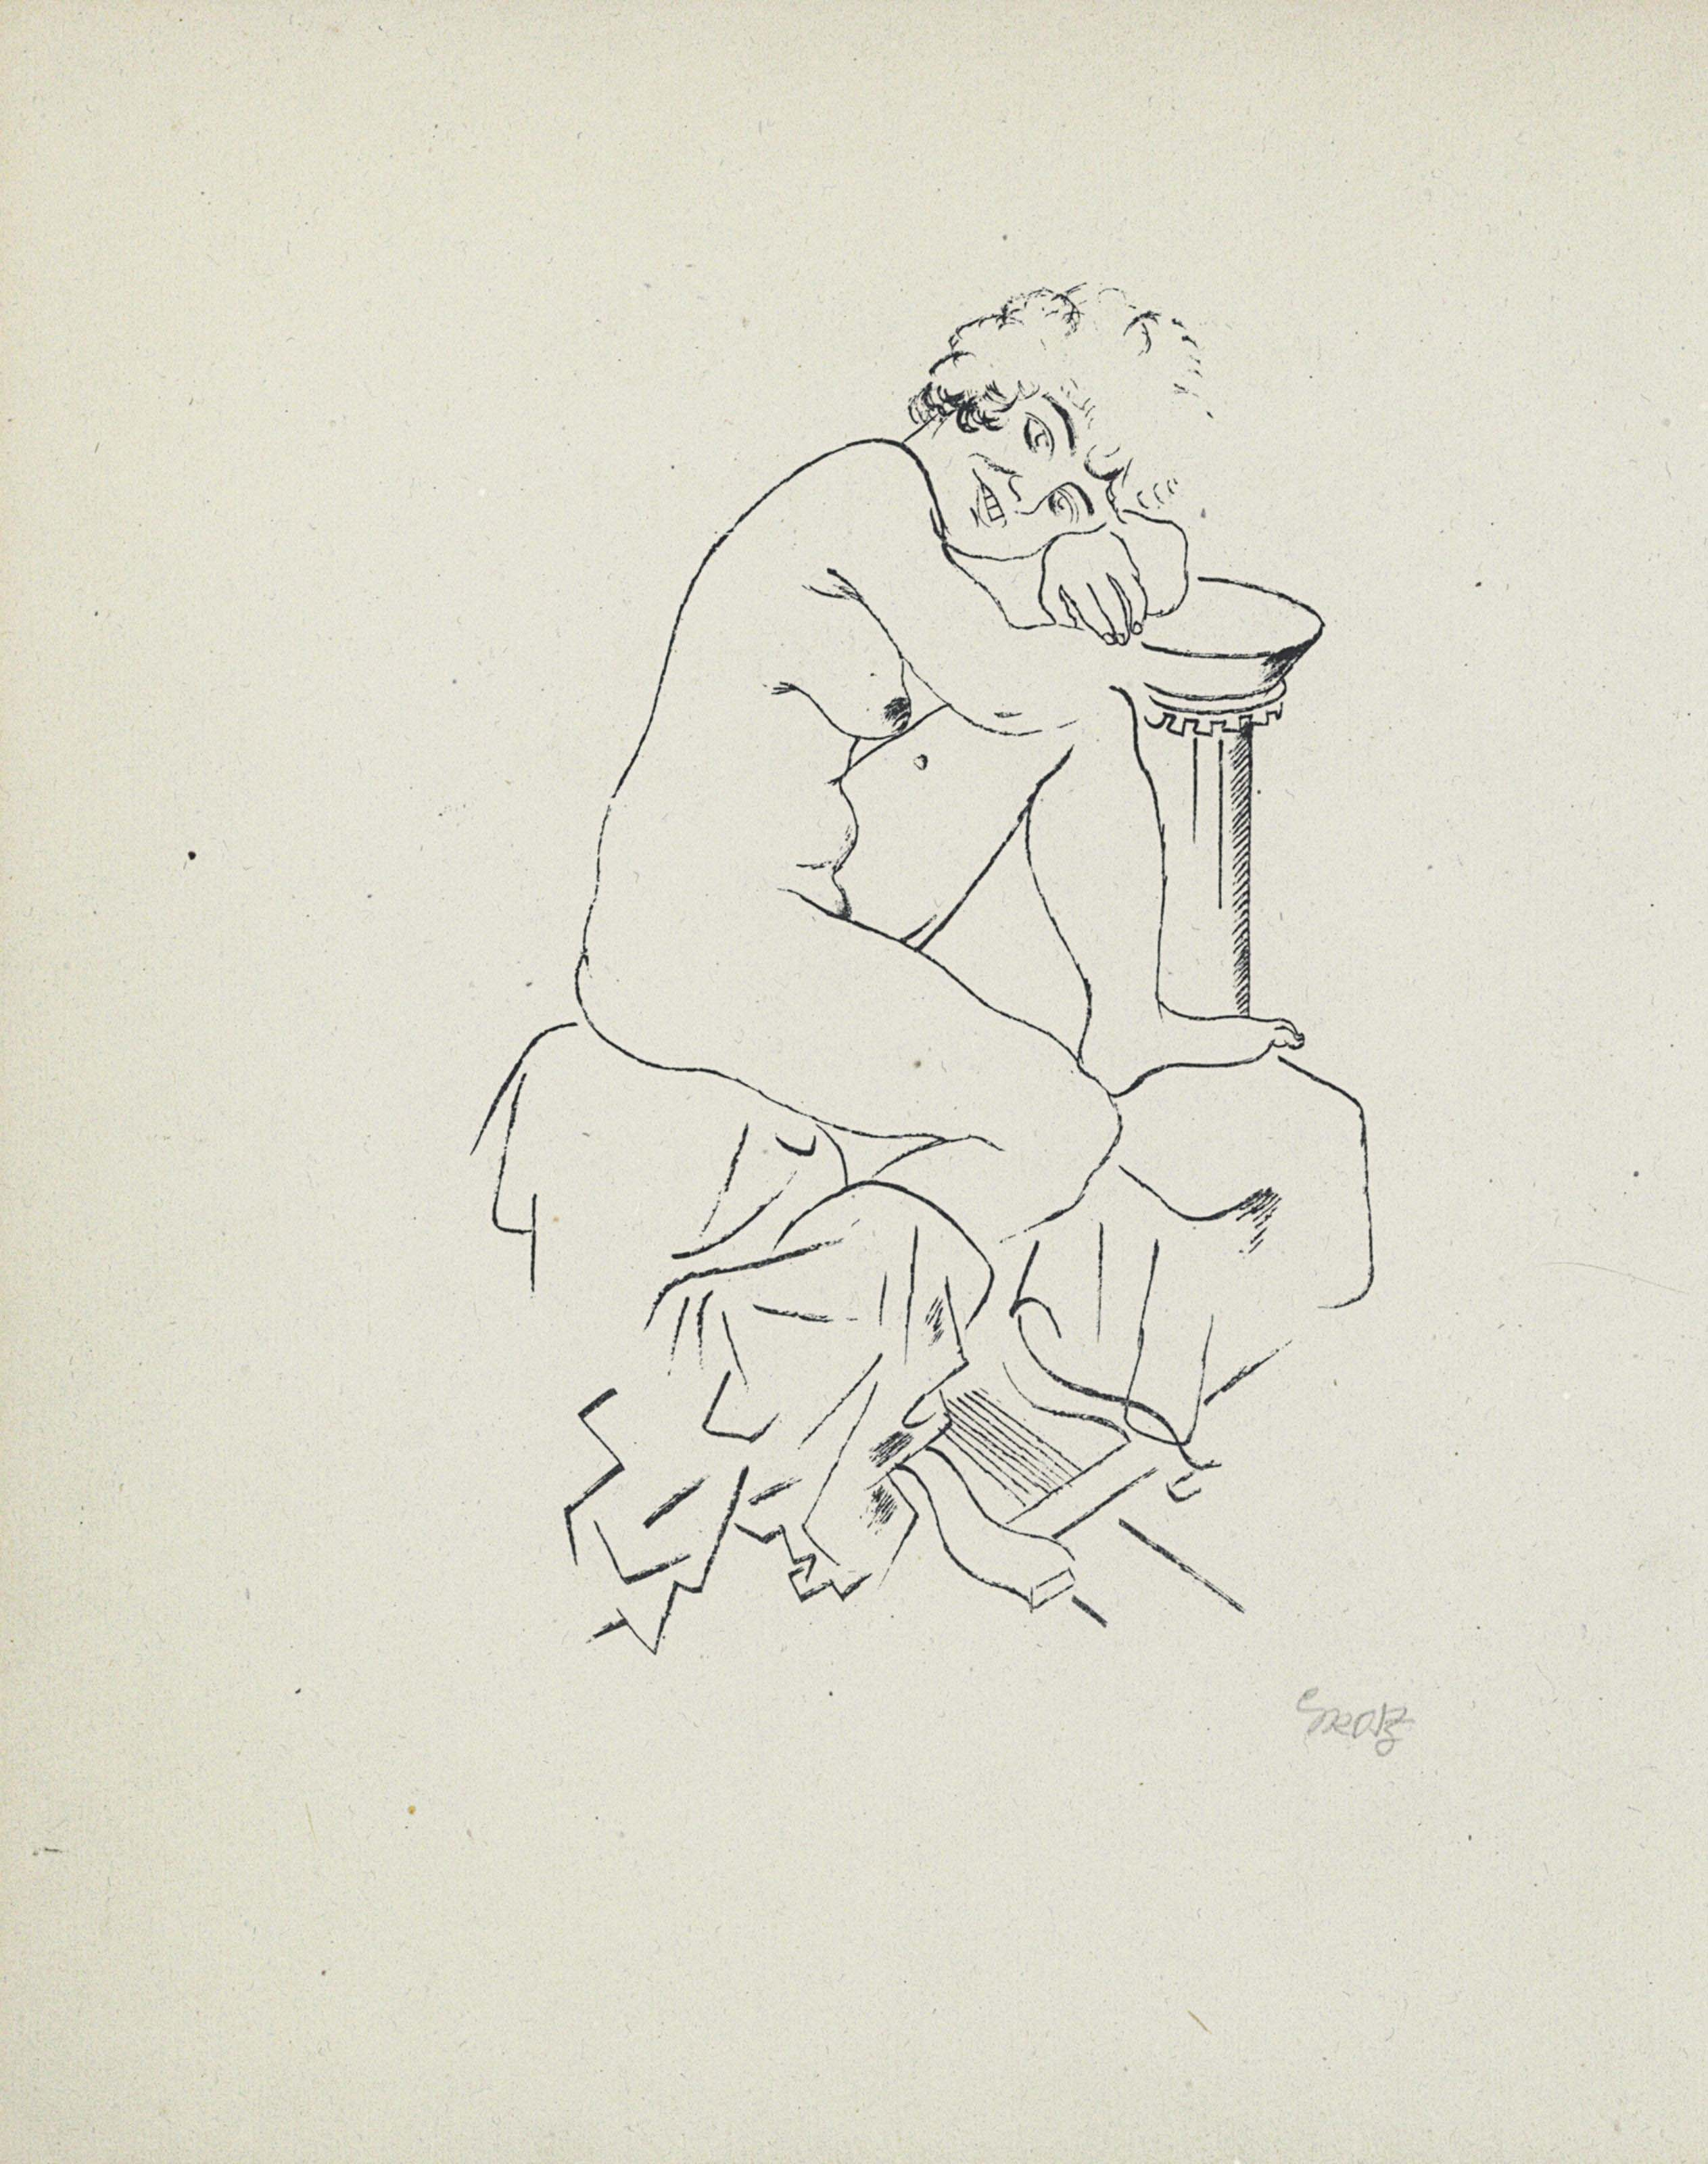 GROSZ, George (1893-1959), ill